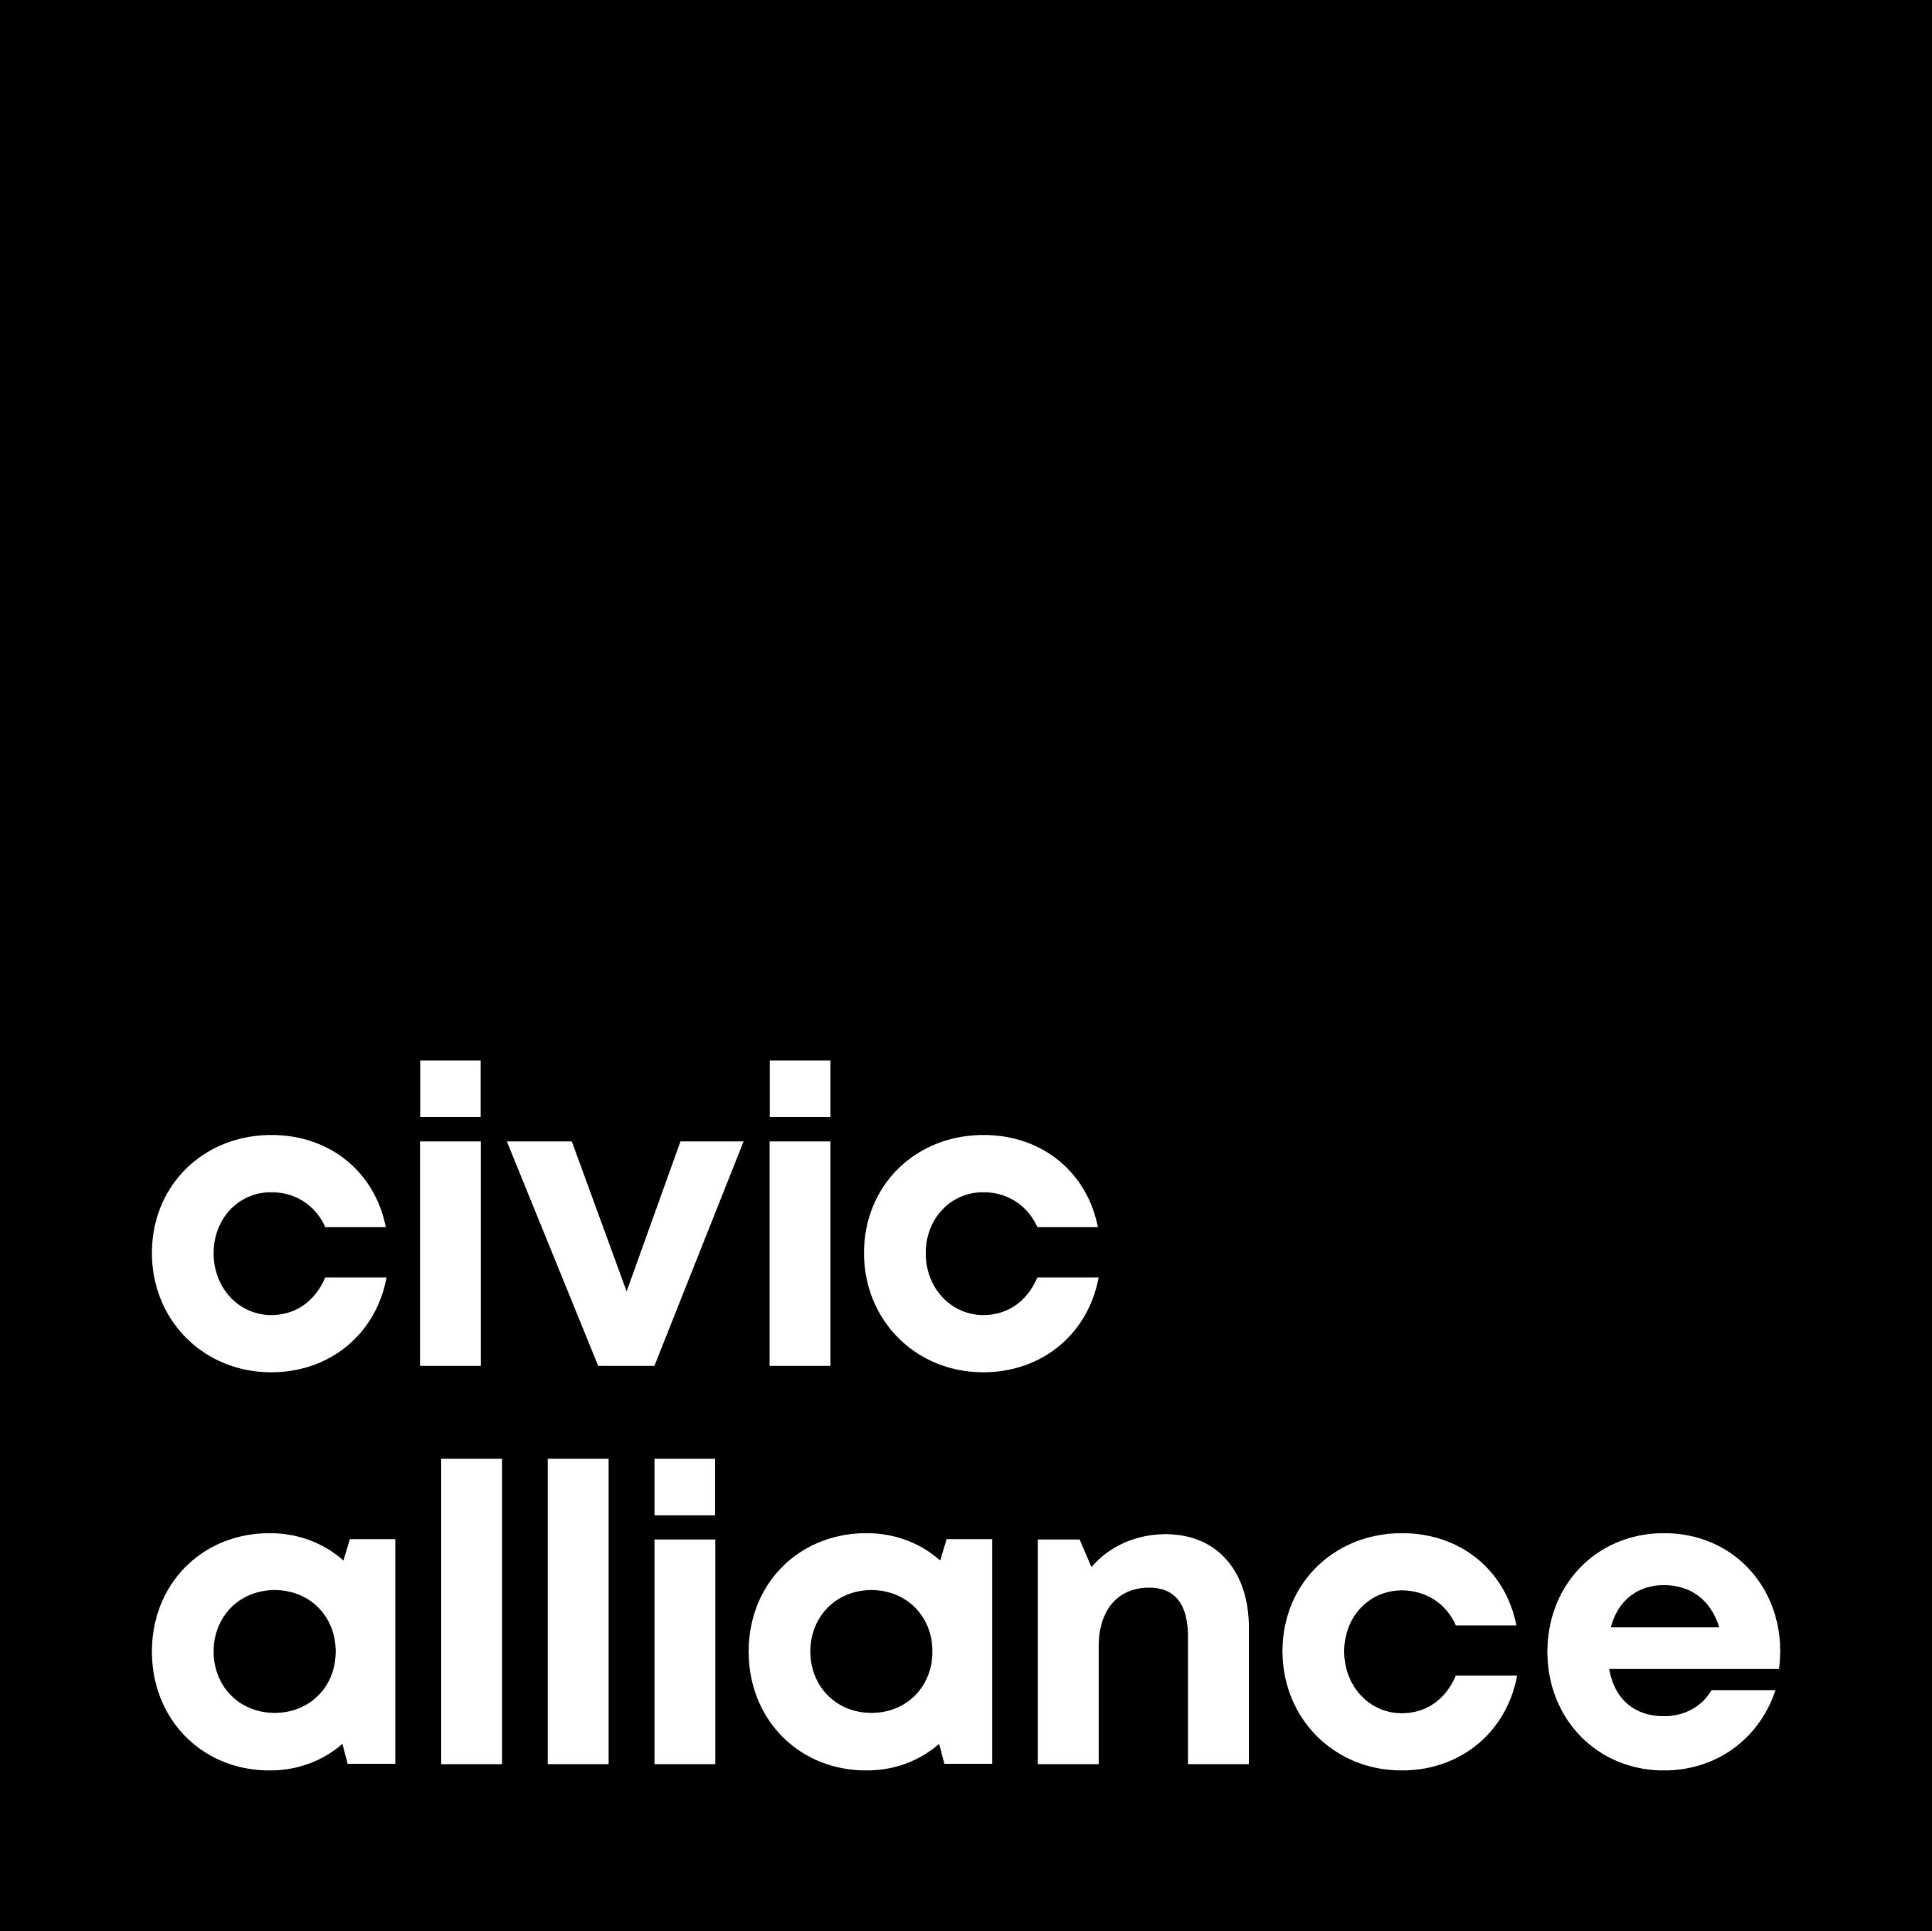 The Civic Alliance logo